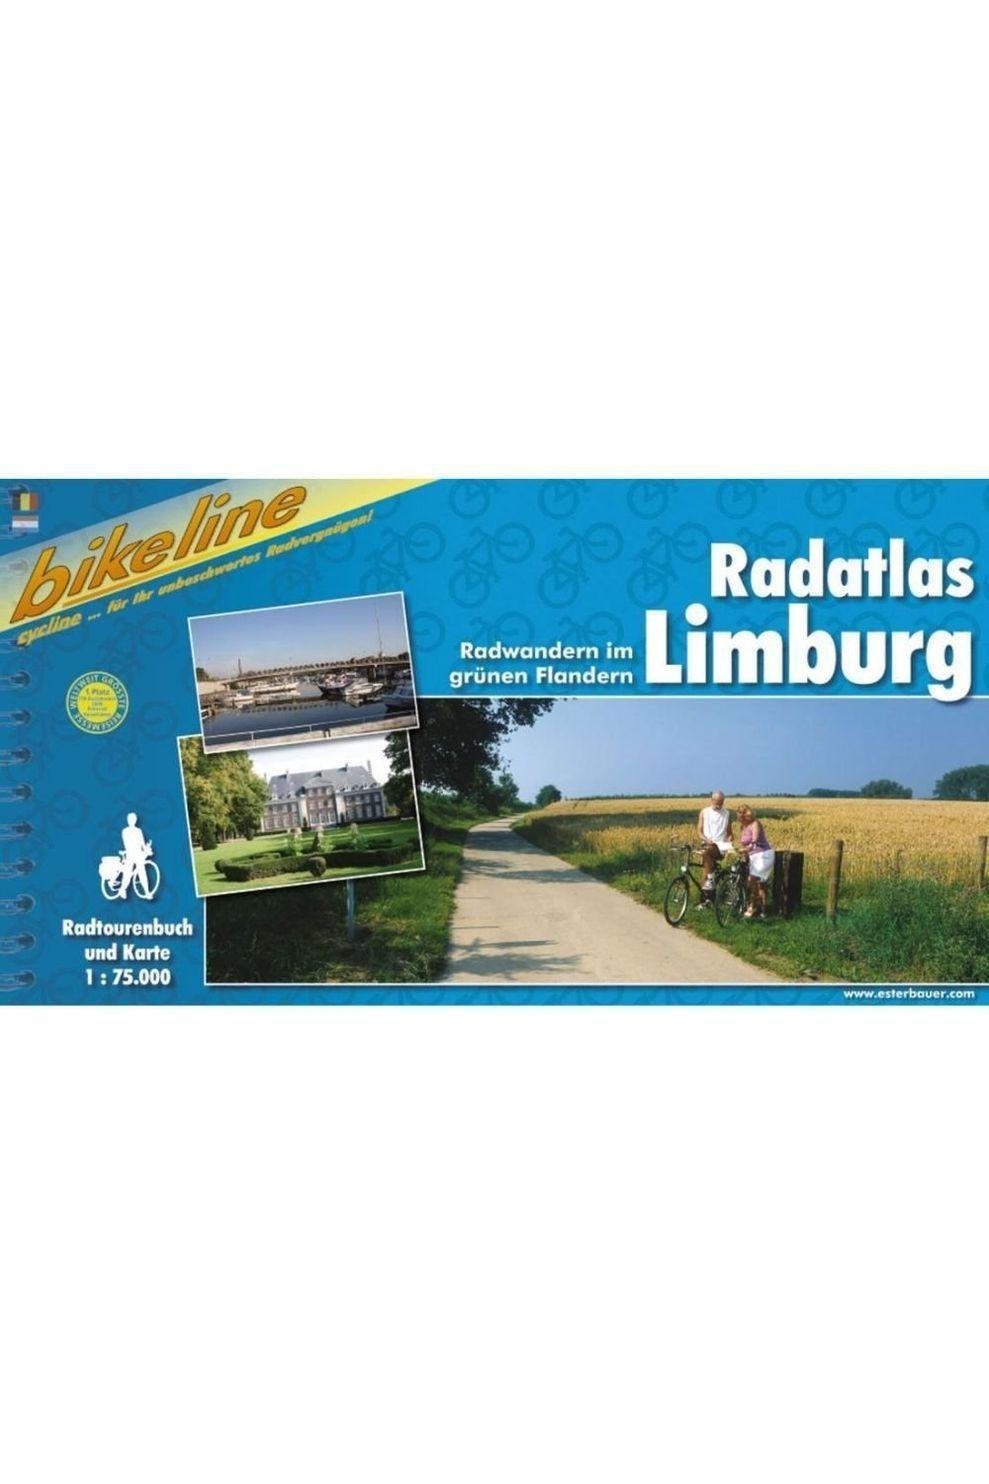 Bikeline Limburg Radatlas Radwandern im grünen Flandern - 2006